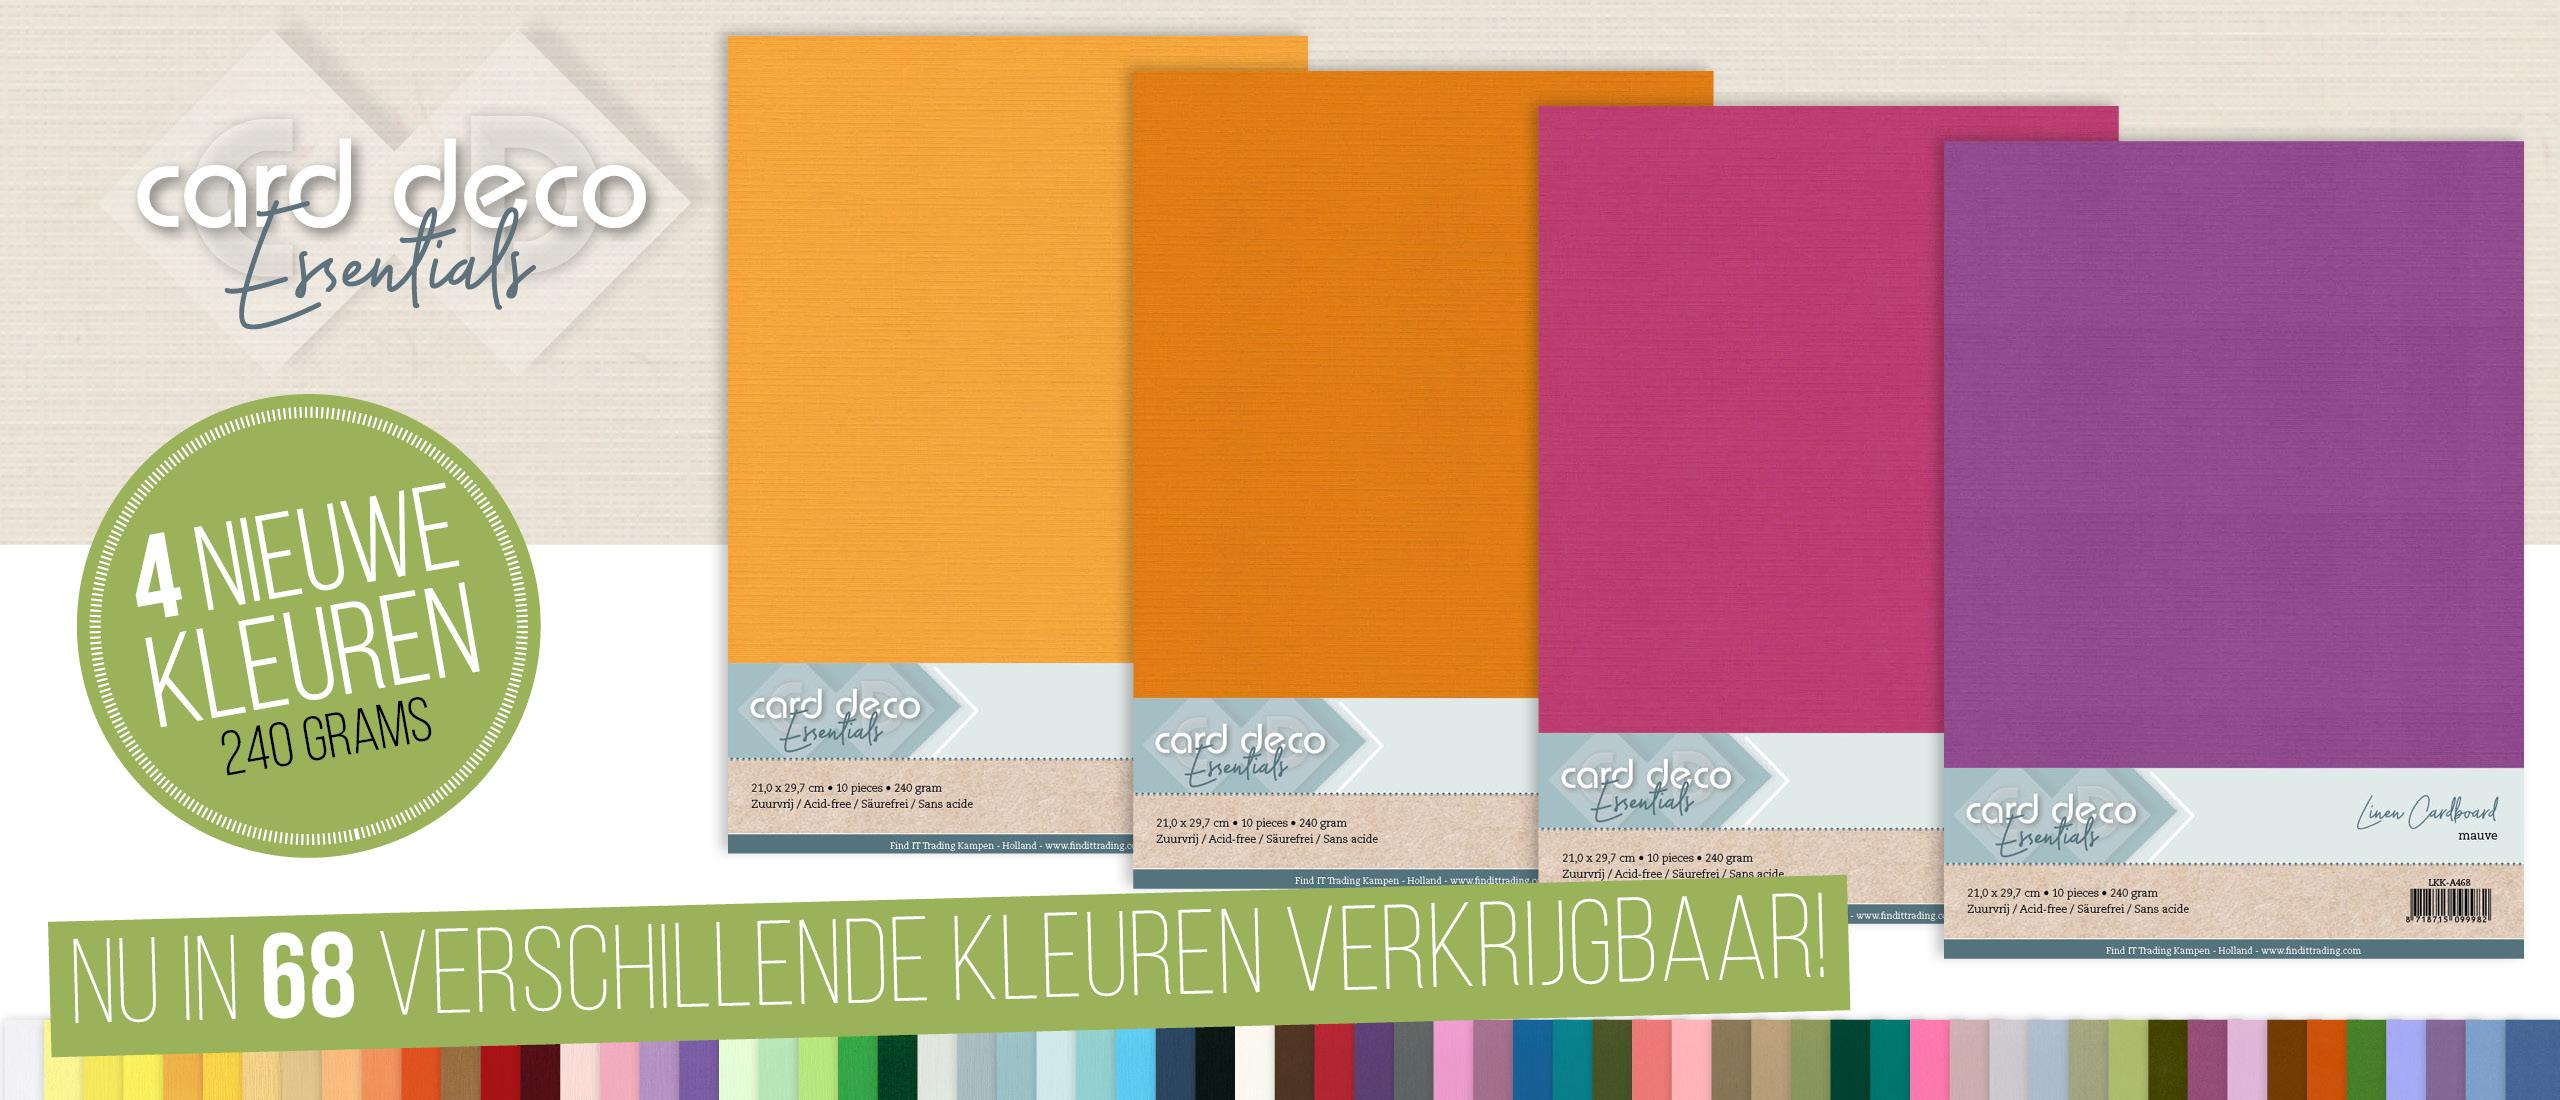 Card Deco Essentials - nieuwe kleuren linnenkarton